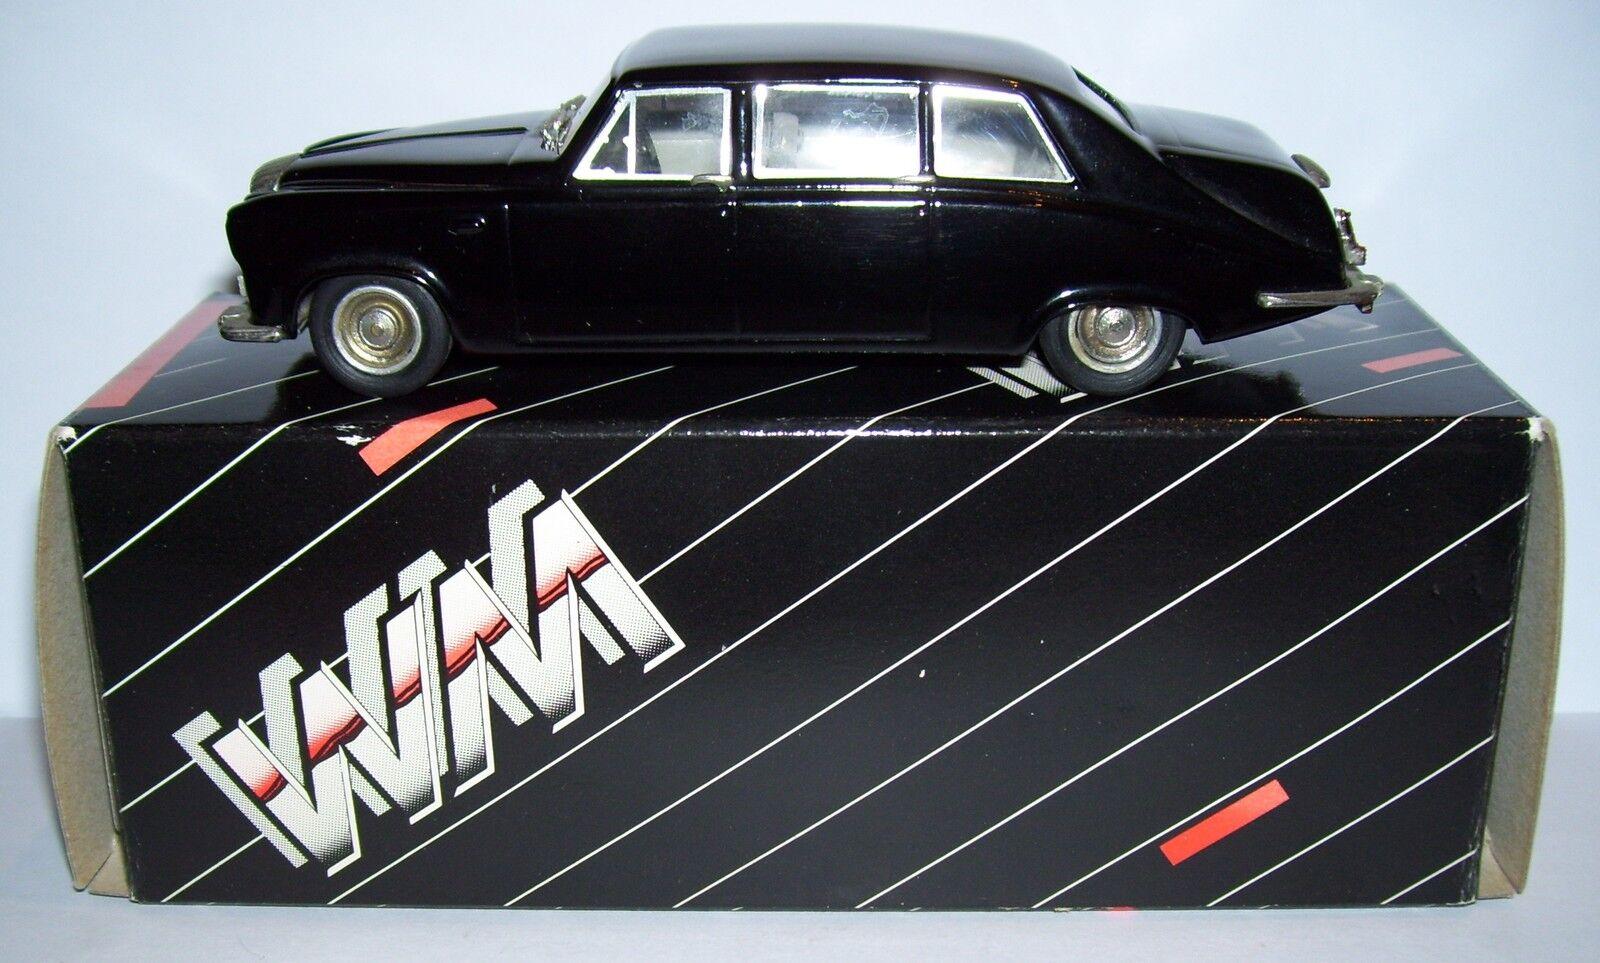 Un súper auto deportivo occidental Wm. Limusina 420, Inglaterra 1973 1   43.